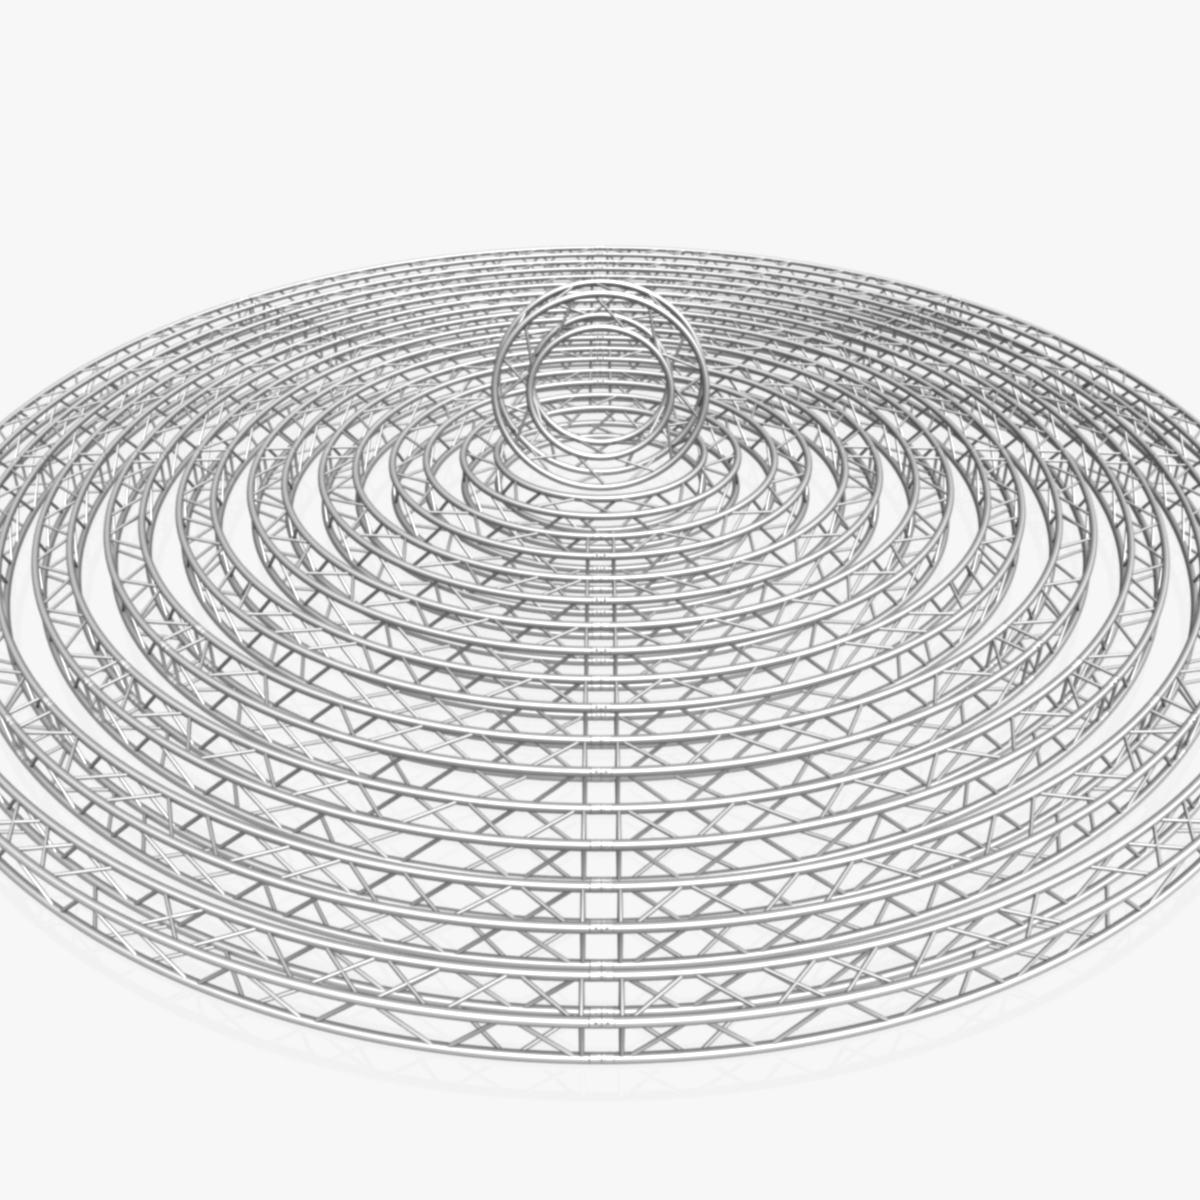 circle square truss modular collection 3d model 3ds max dxf fbx c4d dae  texture obj 252328